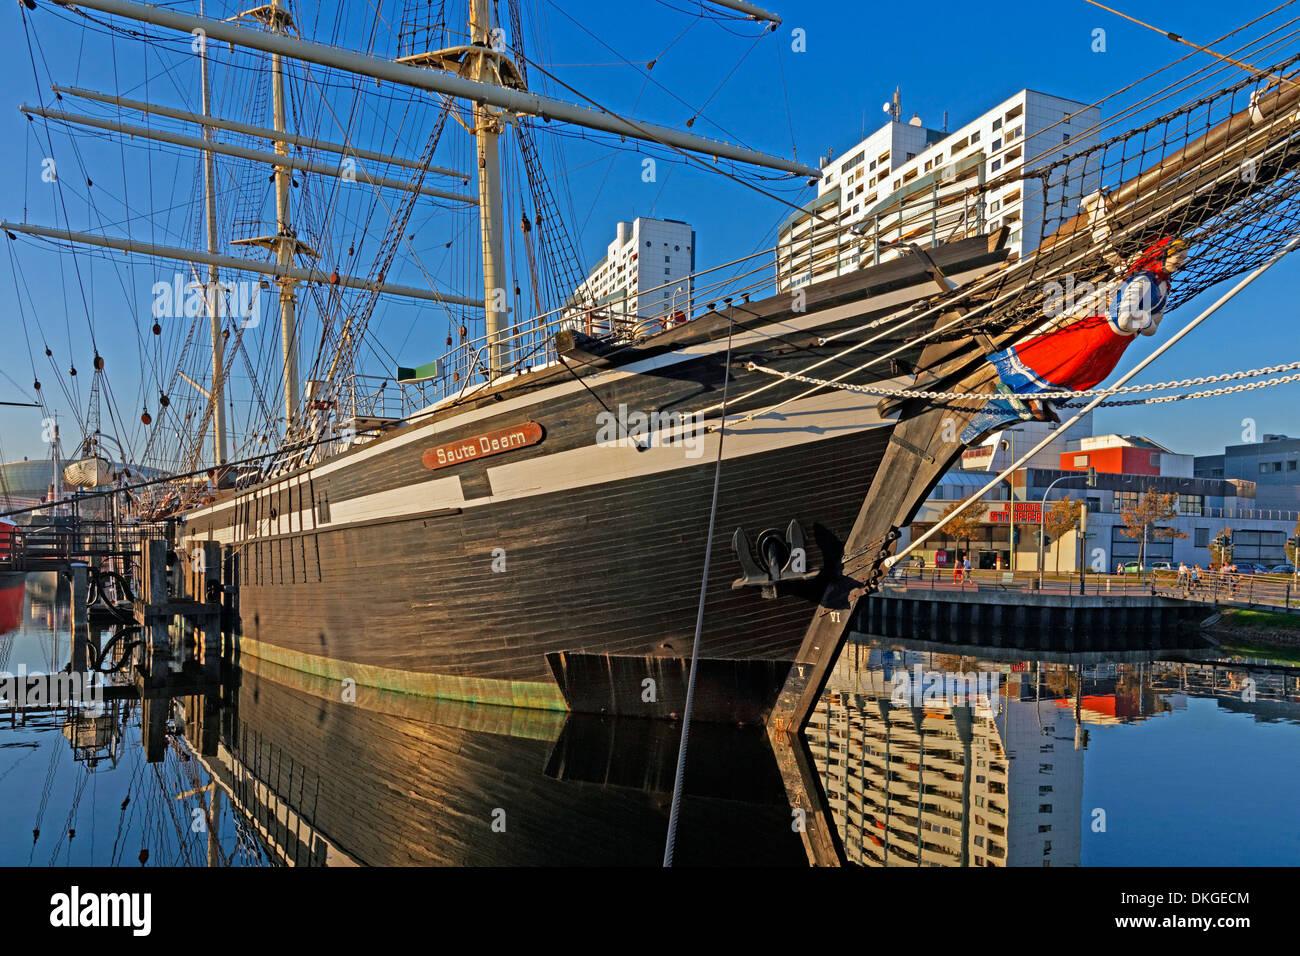 Tall ship and Columbus Center, Alter Hafen, Bremerhaven, Deutschland, Europa Stock Photo